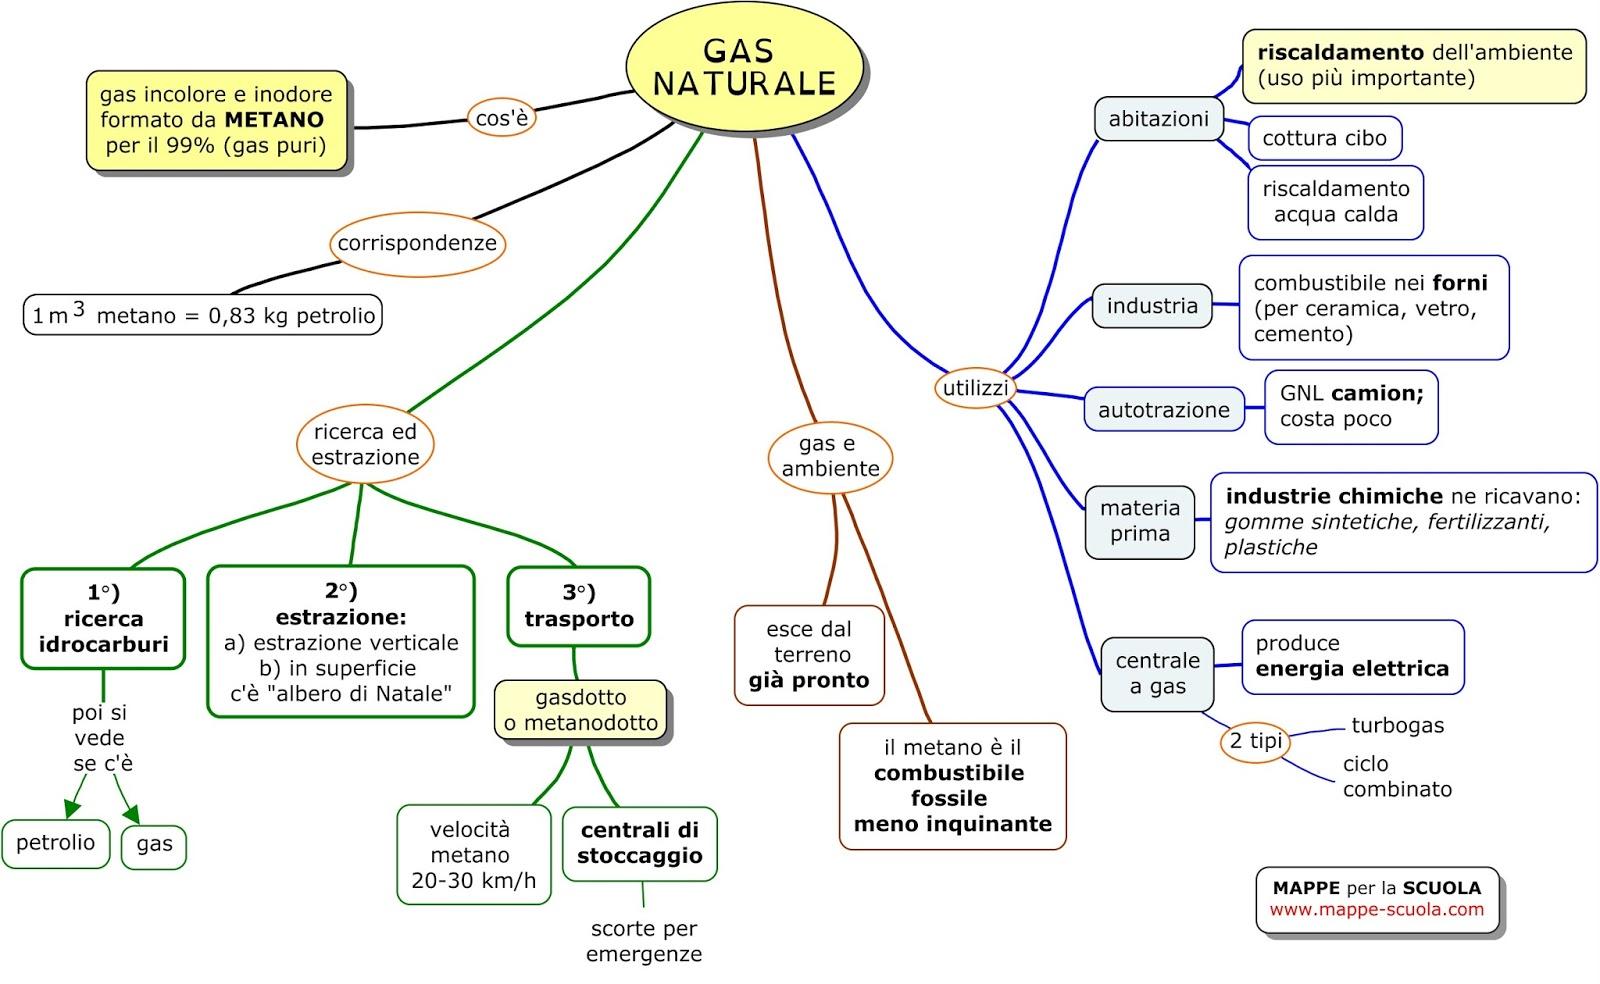 Gas Naturale  lezionitecnologias jimdo page